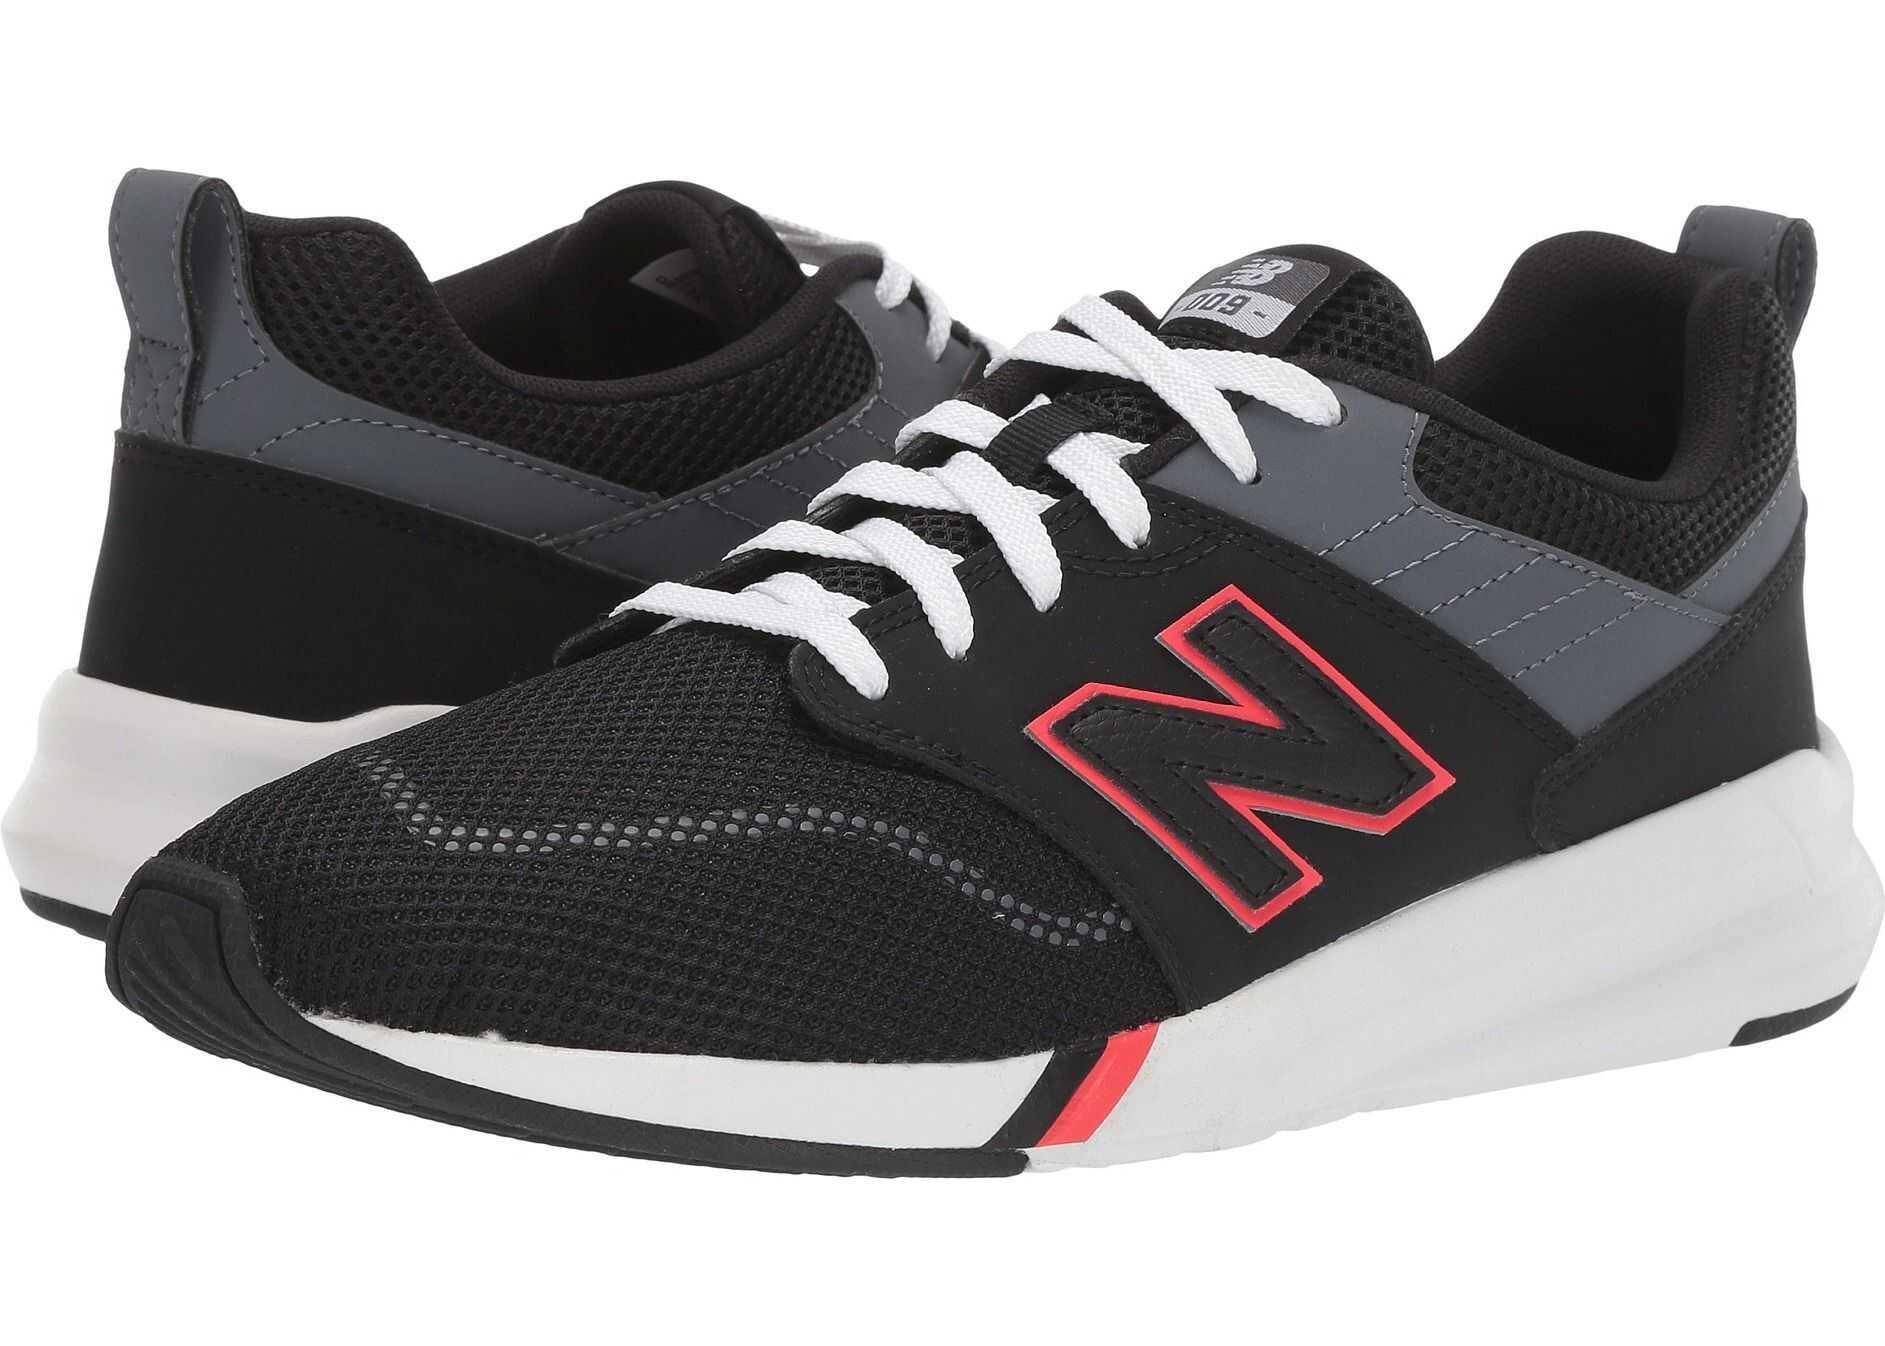 New Balance MS009 Black/Lead